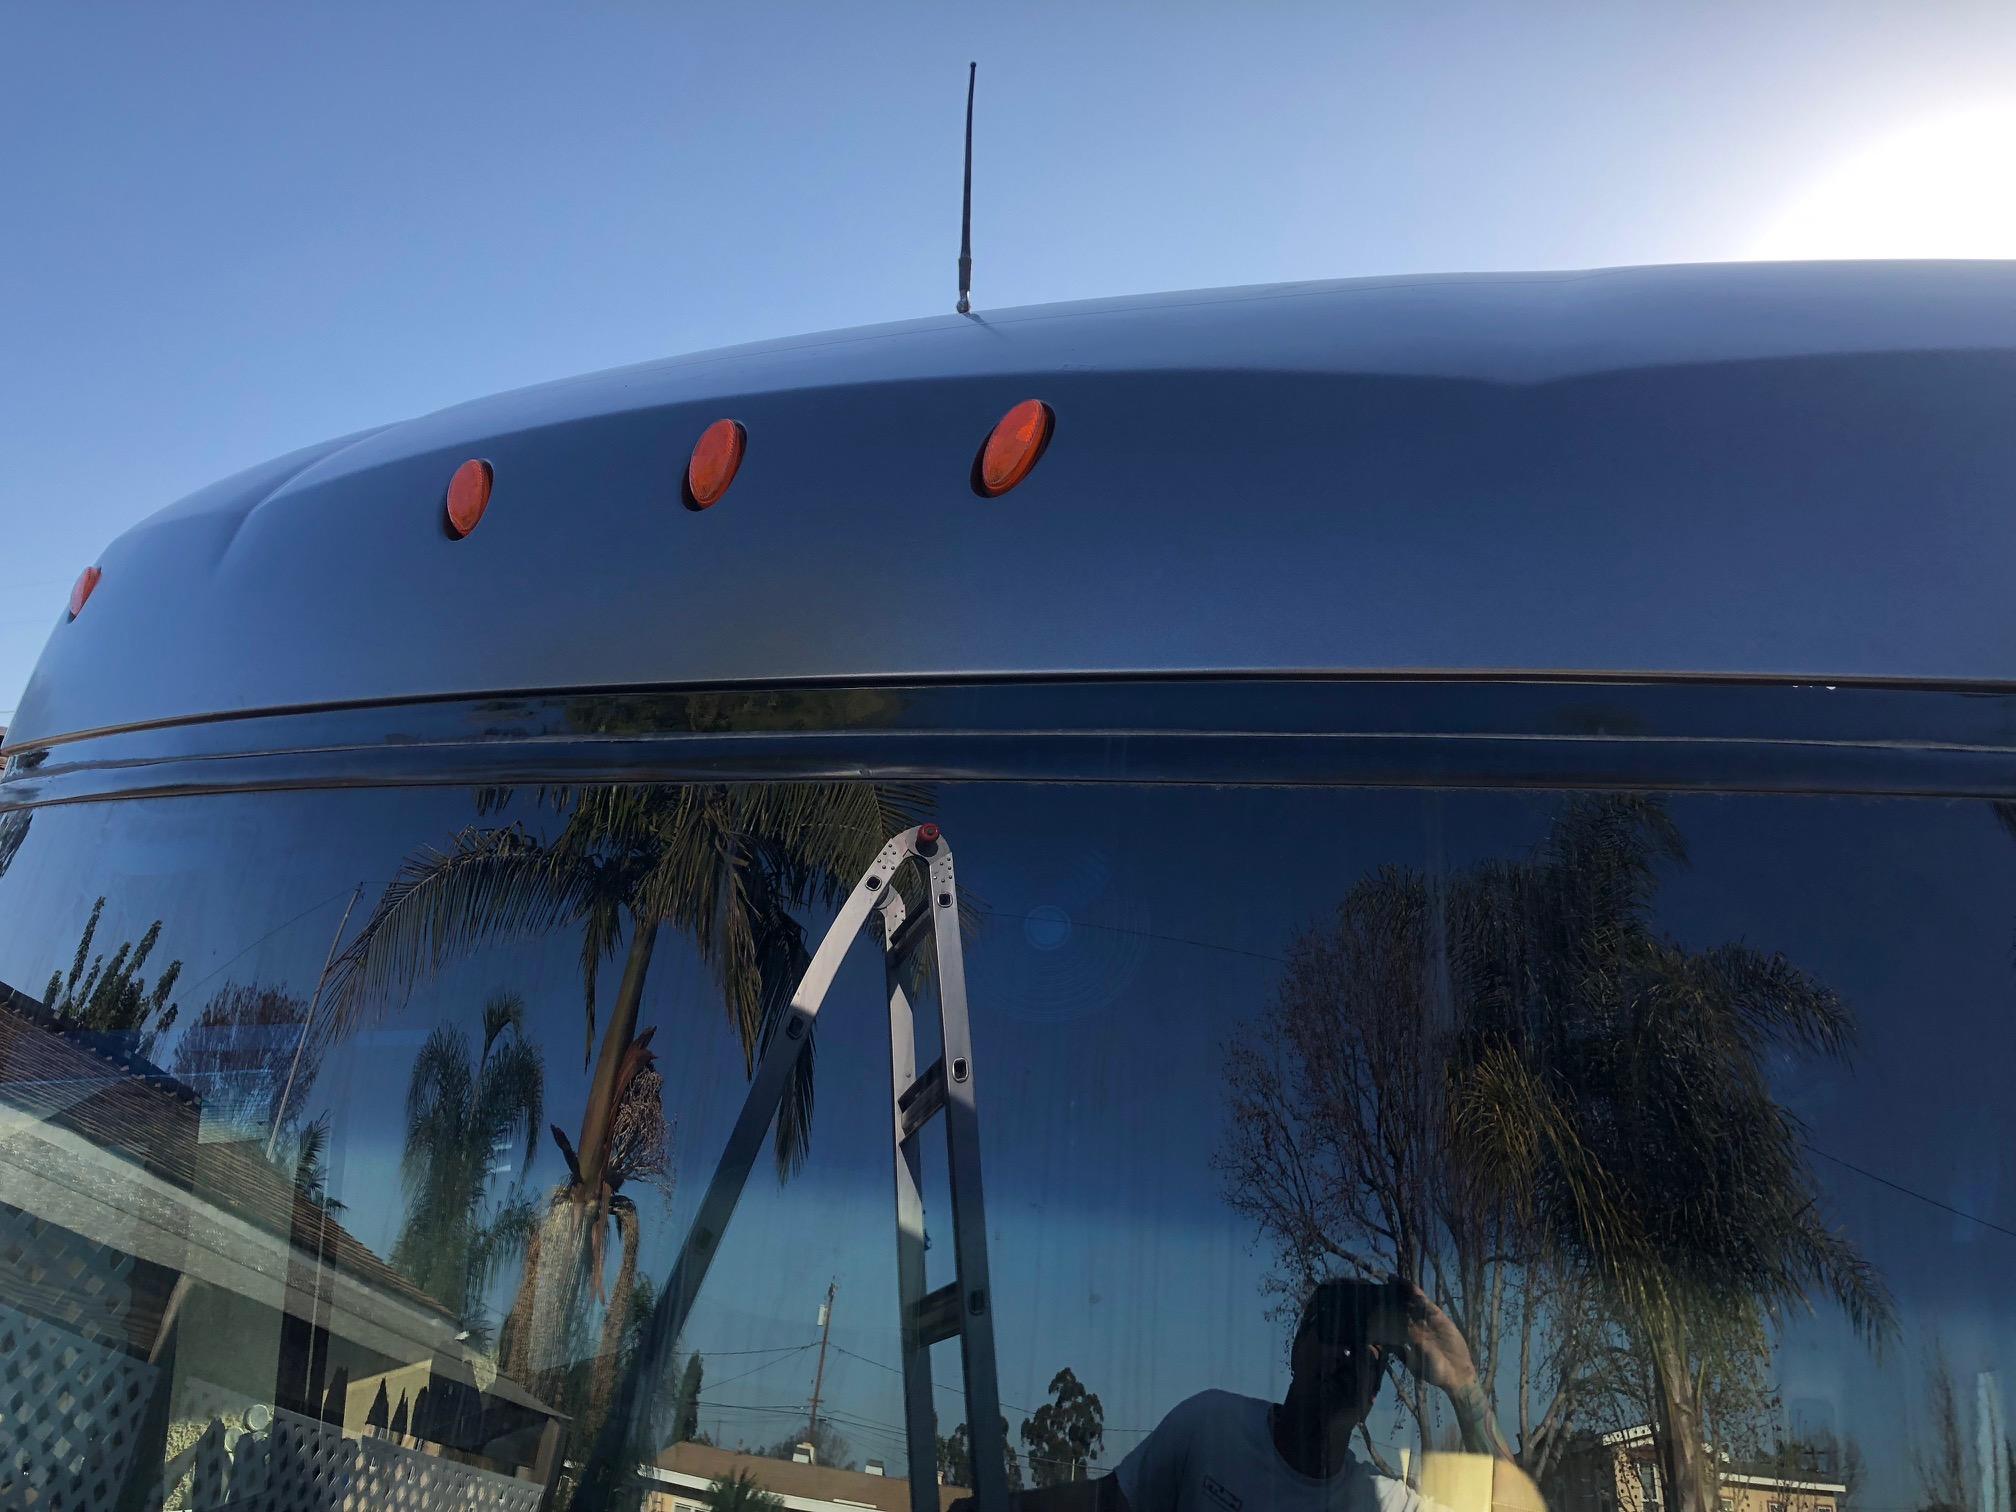 Engraving Vehicle Wraps Signs Long Beach Precision Engraving